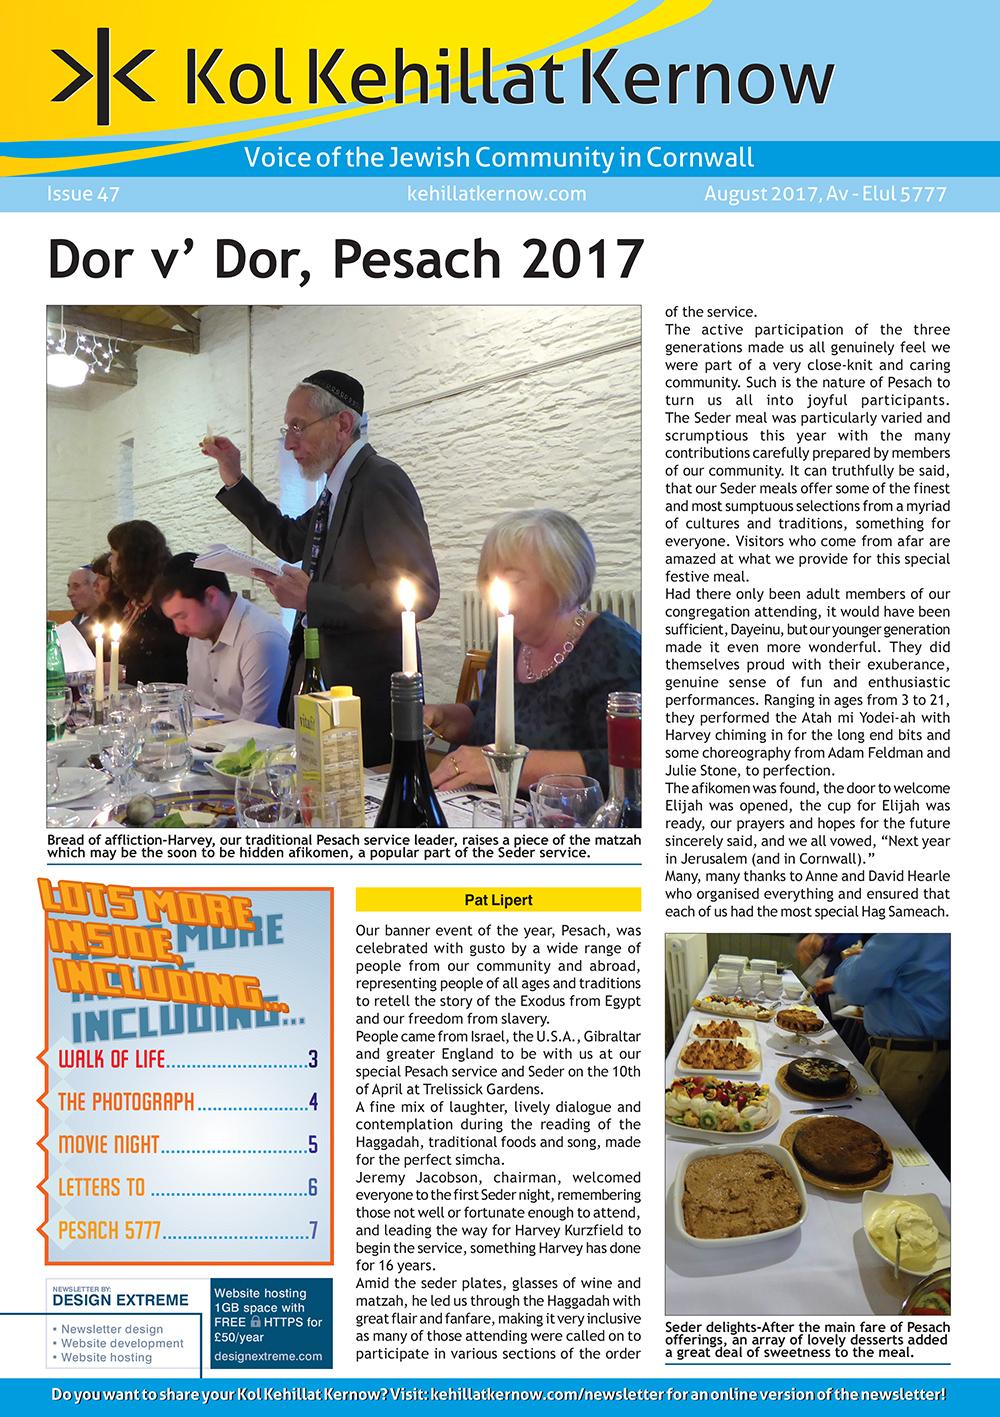 Kol Kehillat Kernow Cover - Issue 46 - April 2017